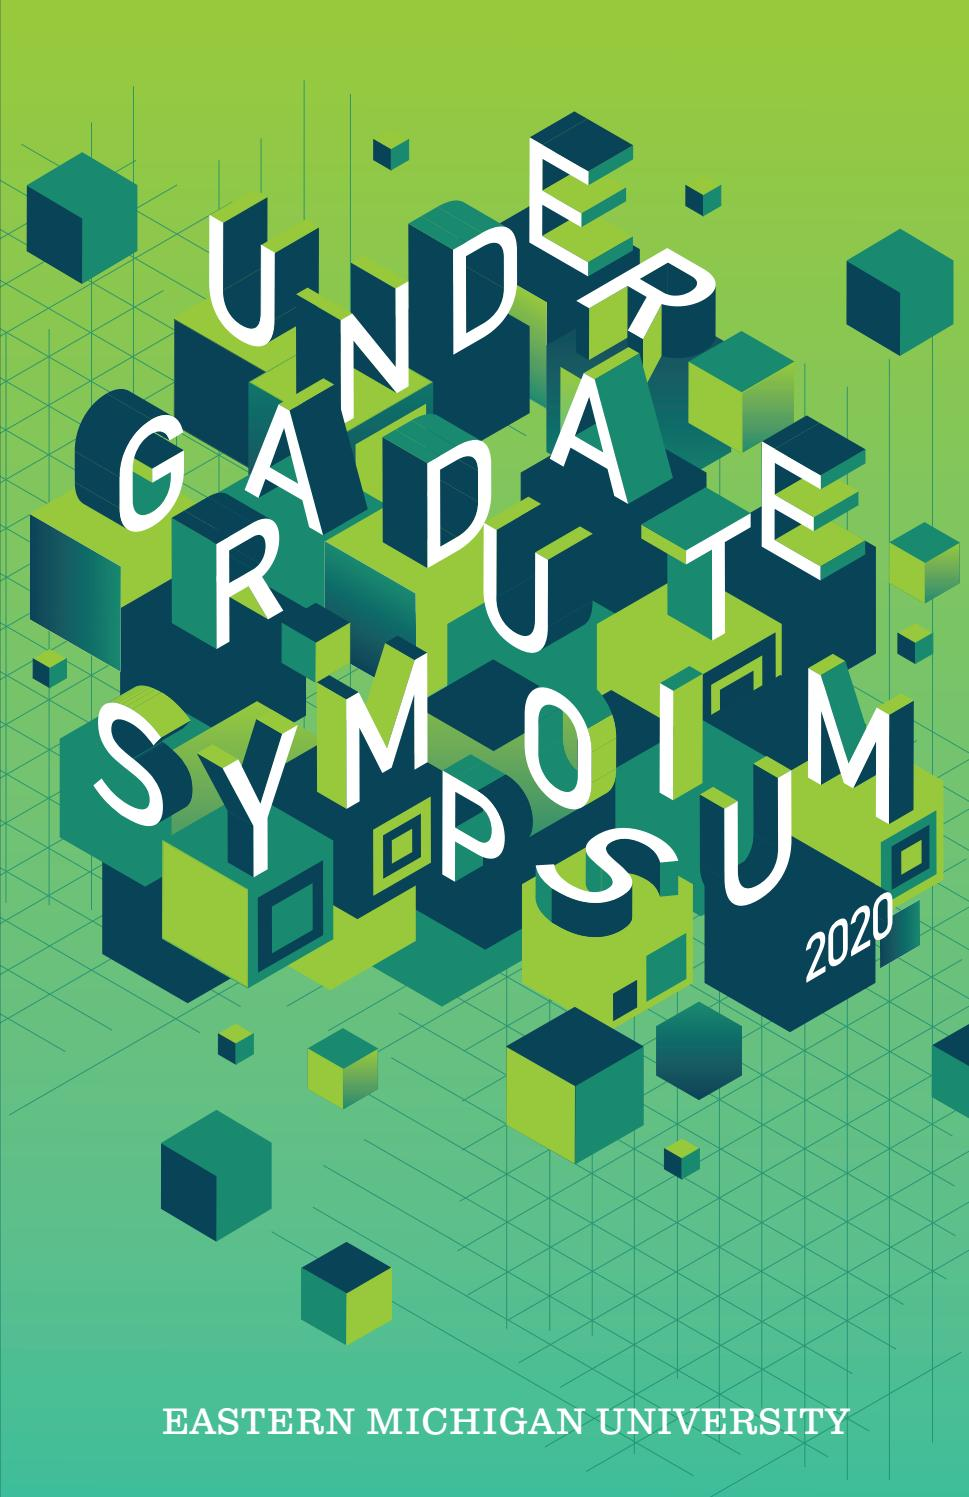 Emu Undergraduate Symposium 40 By Emu Graphic Design Issuu